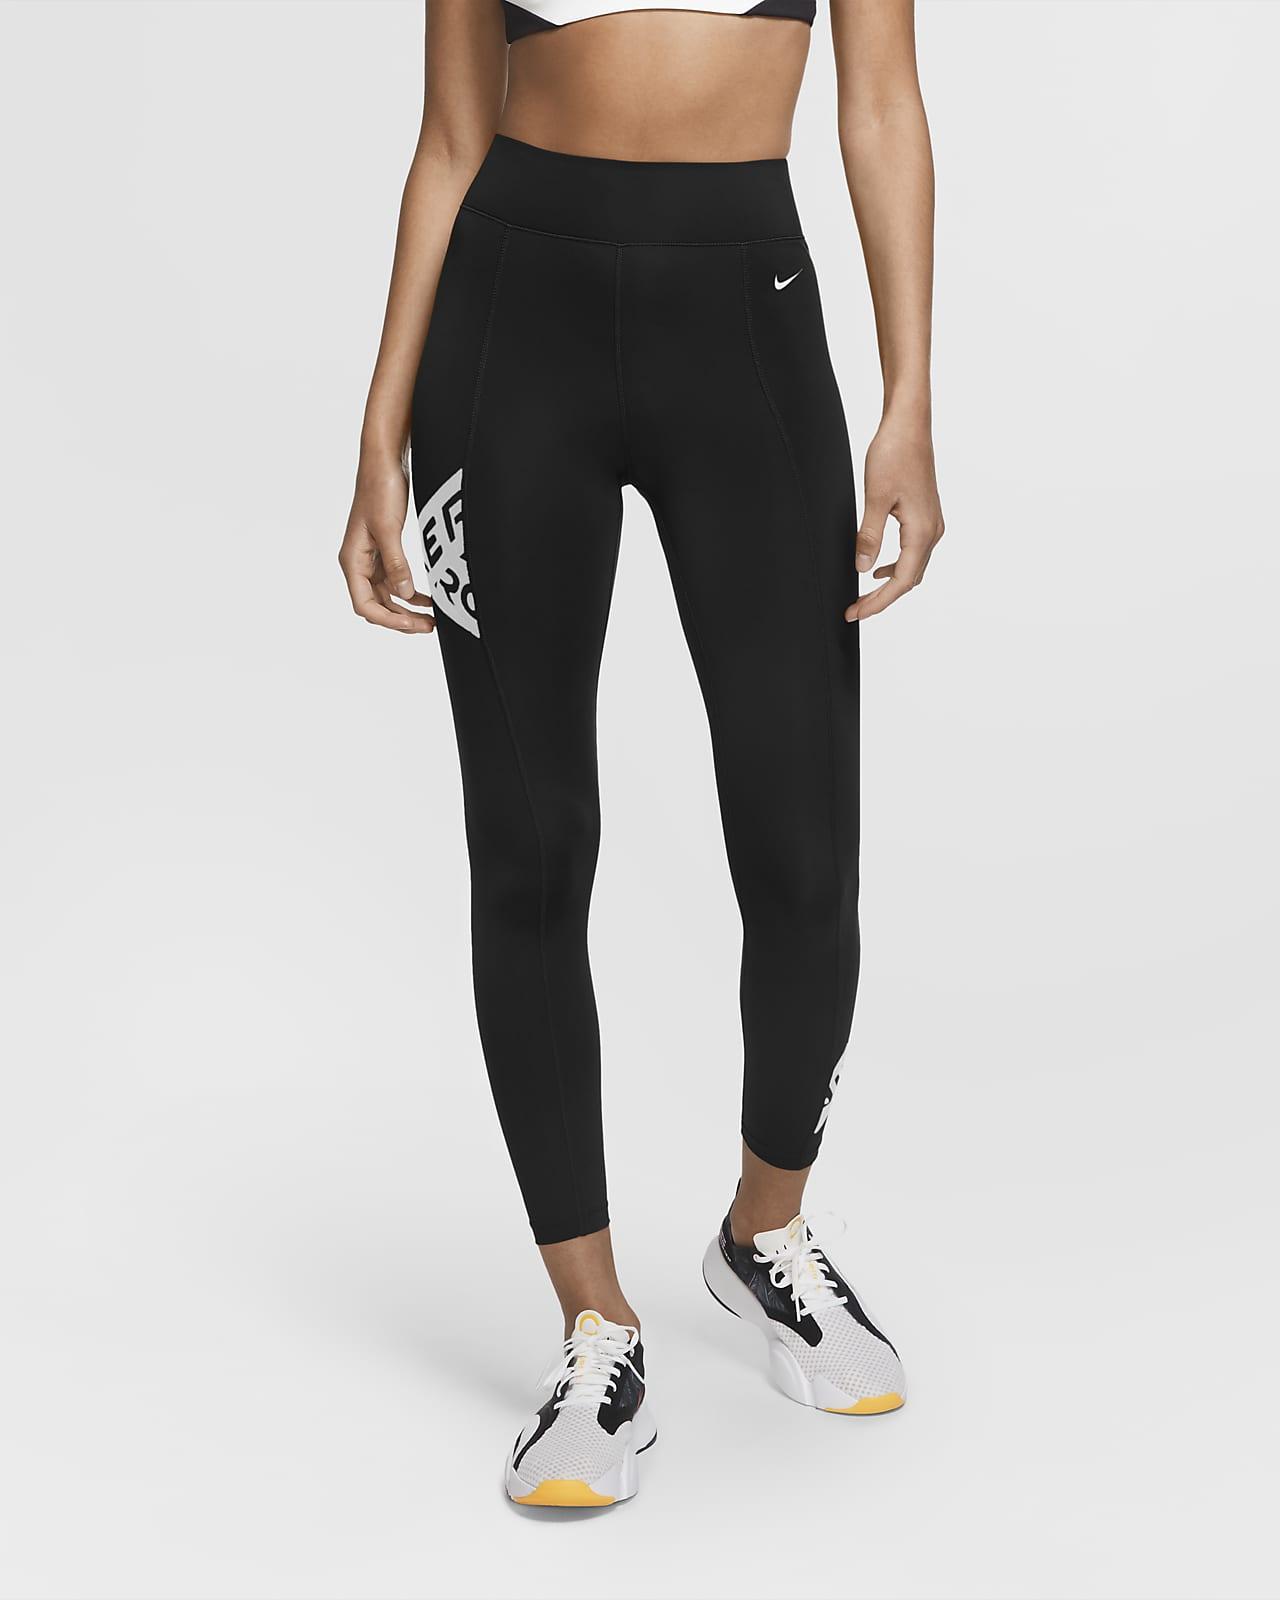 Nike Pro Malles de 7/8 estampades - Dona